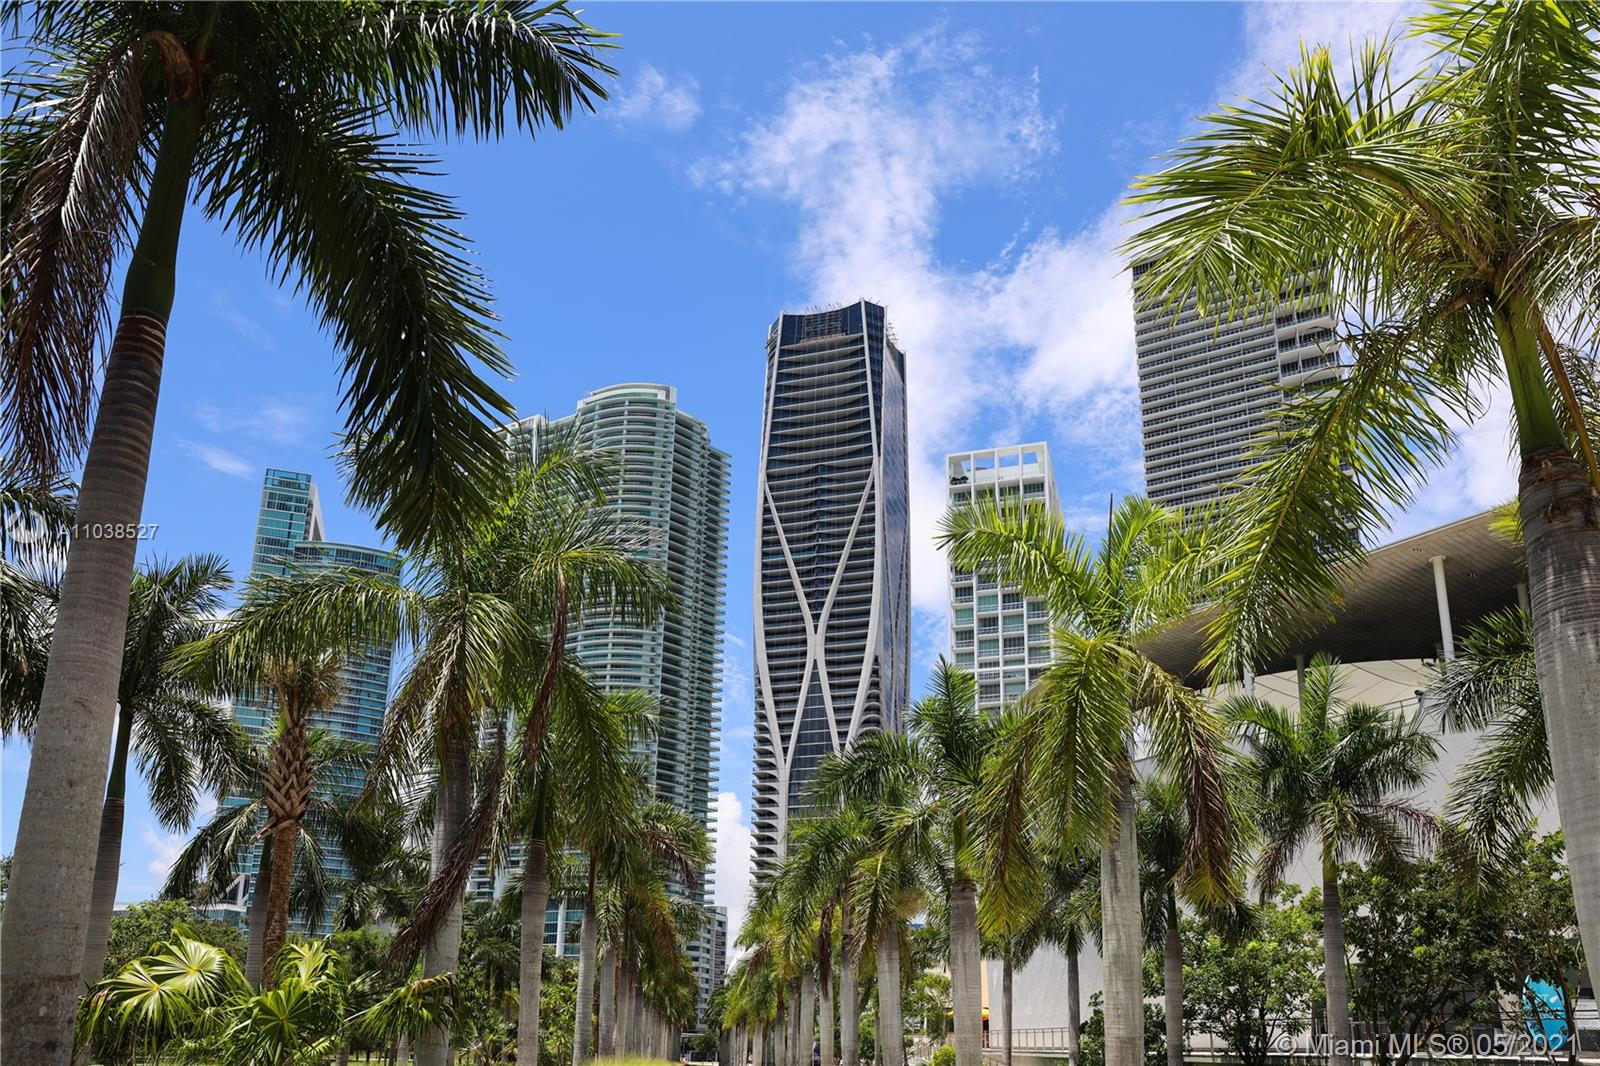 1000 Biscayne Blvd PH-5101, Miami, FL 33132